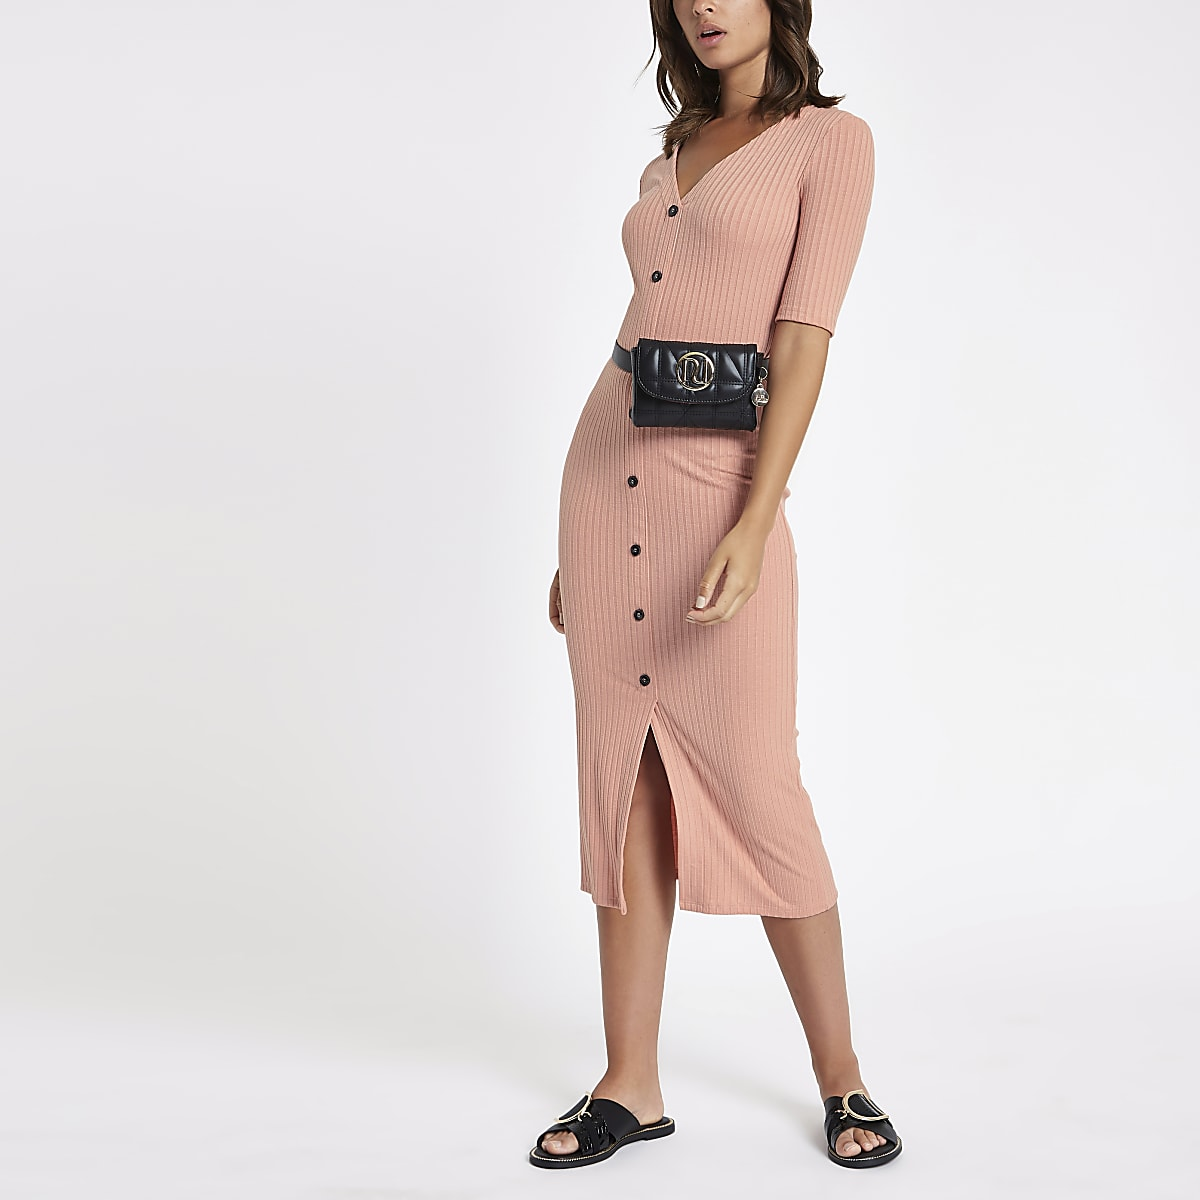 9a4b978a899f Pink button short sleeve midi bodycon dress - Bodycon Dresses ...